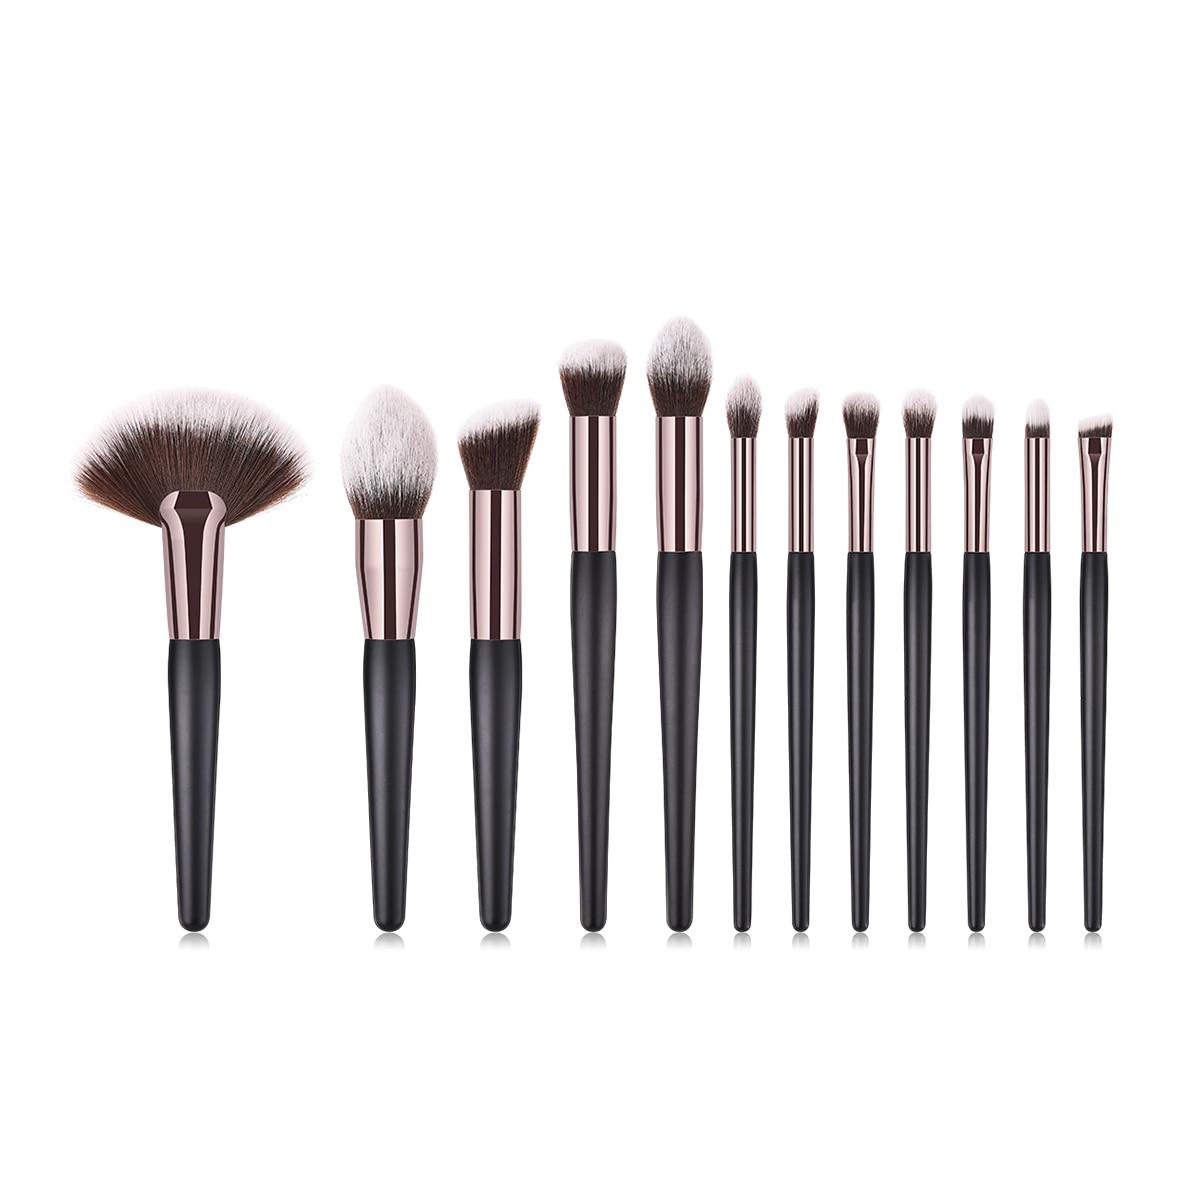 BBL 12pcs Black Makeup Brushes Set Tools Large Fan Kabuki Brush Powder Foundation Fluffy Buff Blender Brushes Pincel Maquiagem